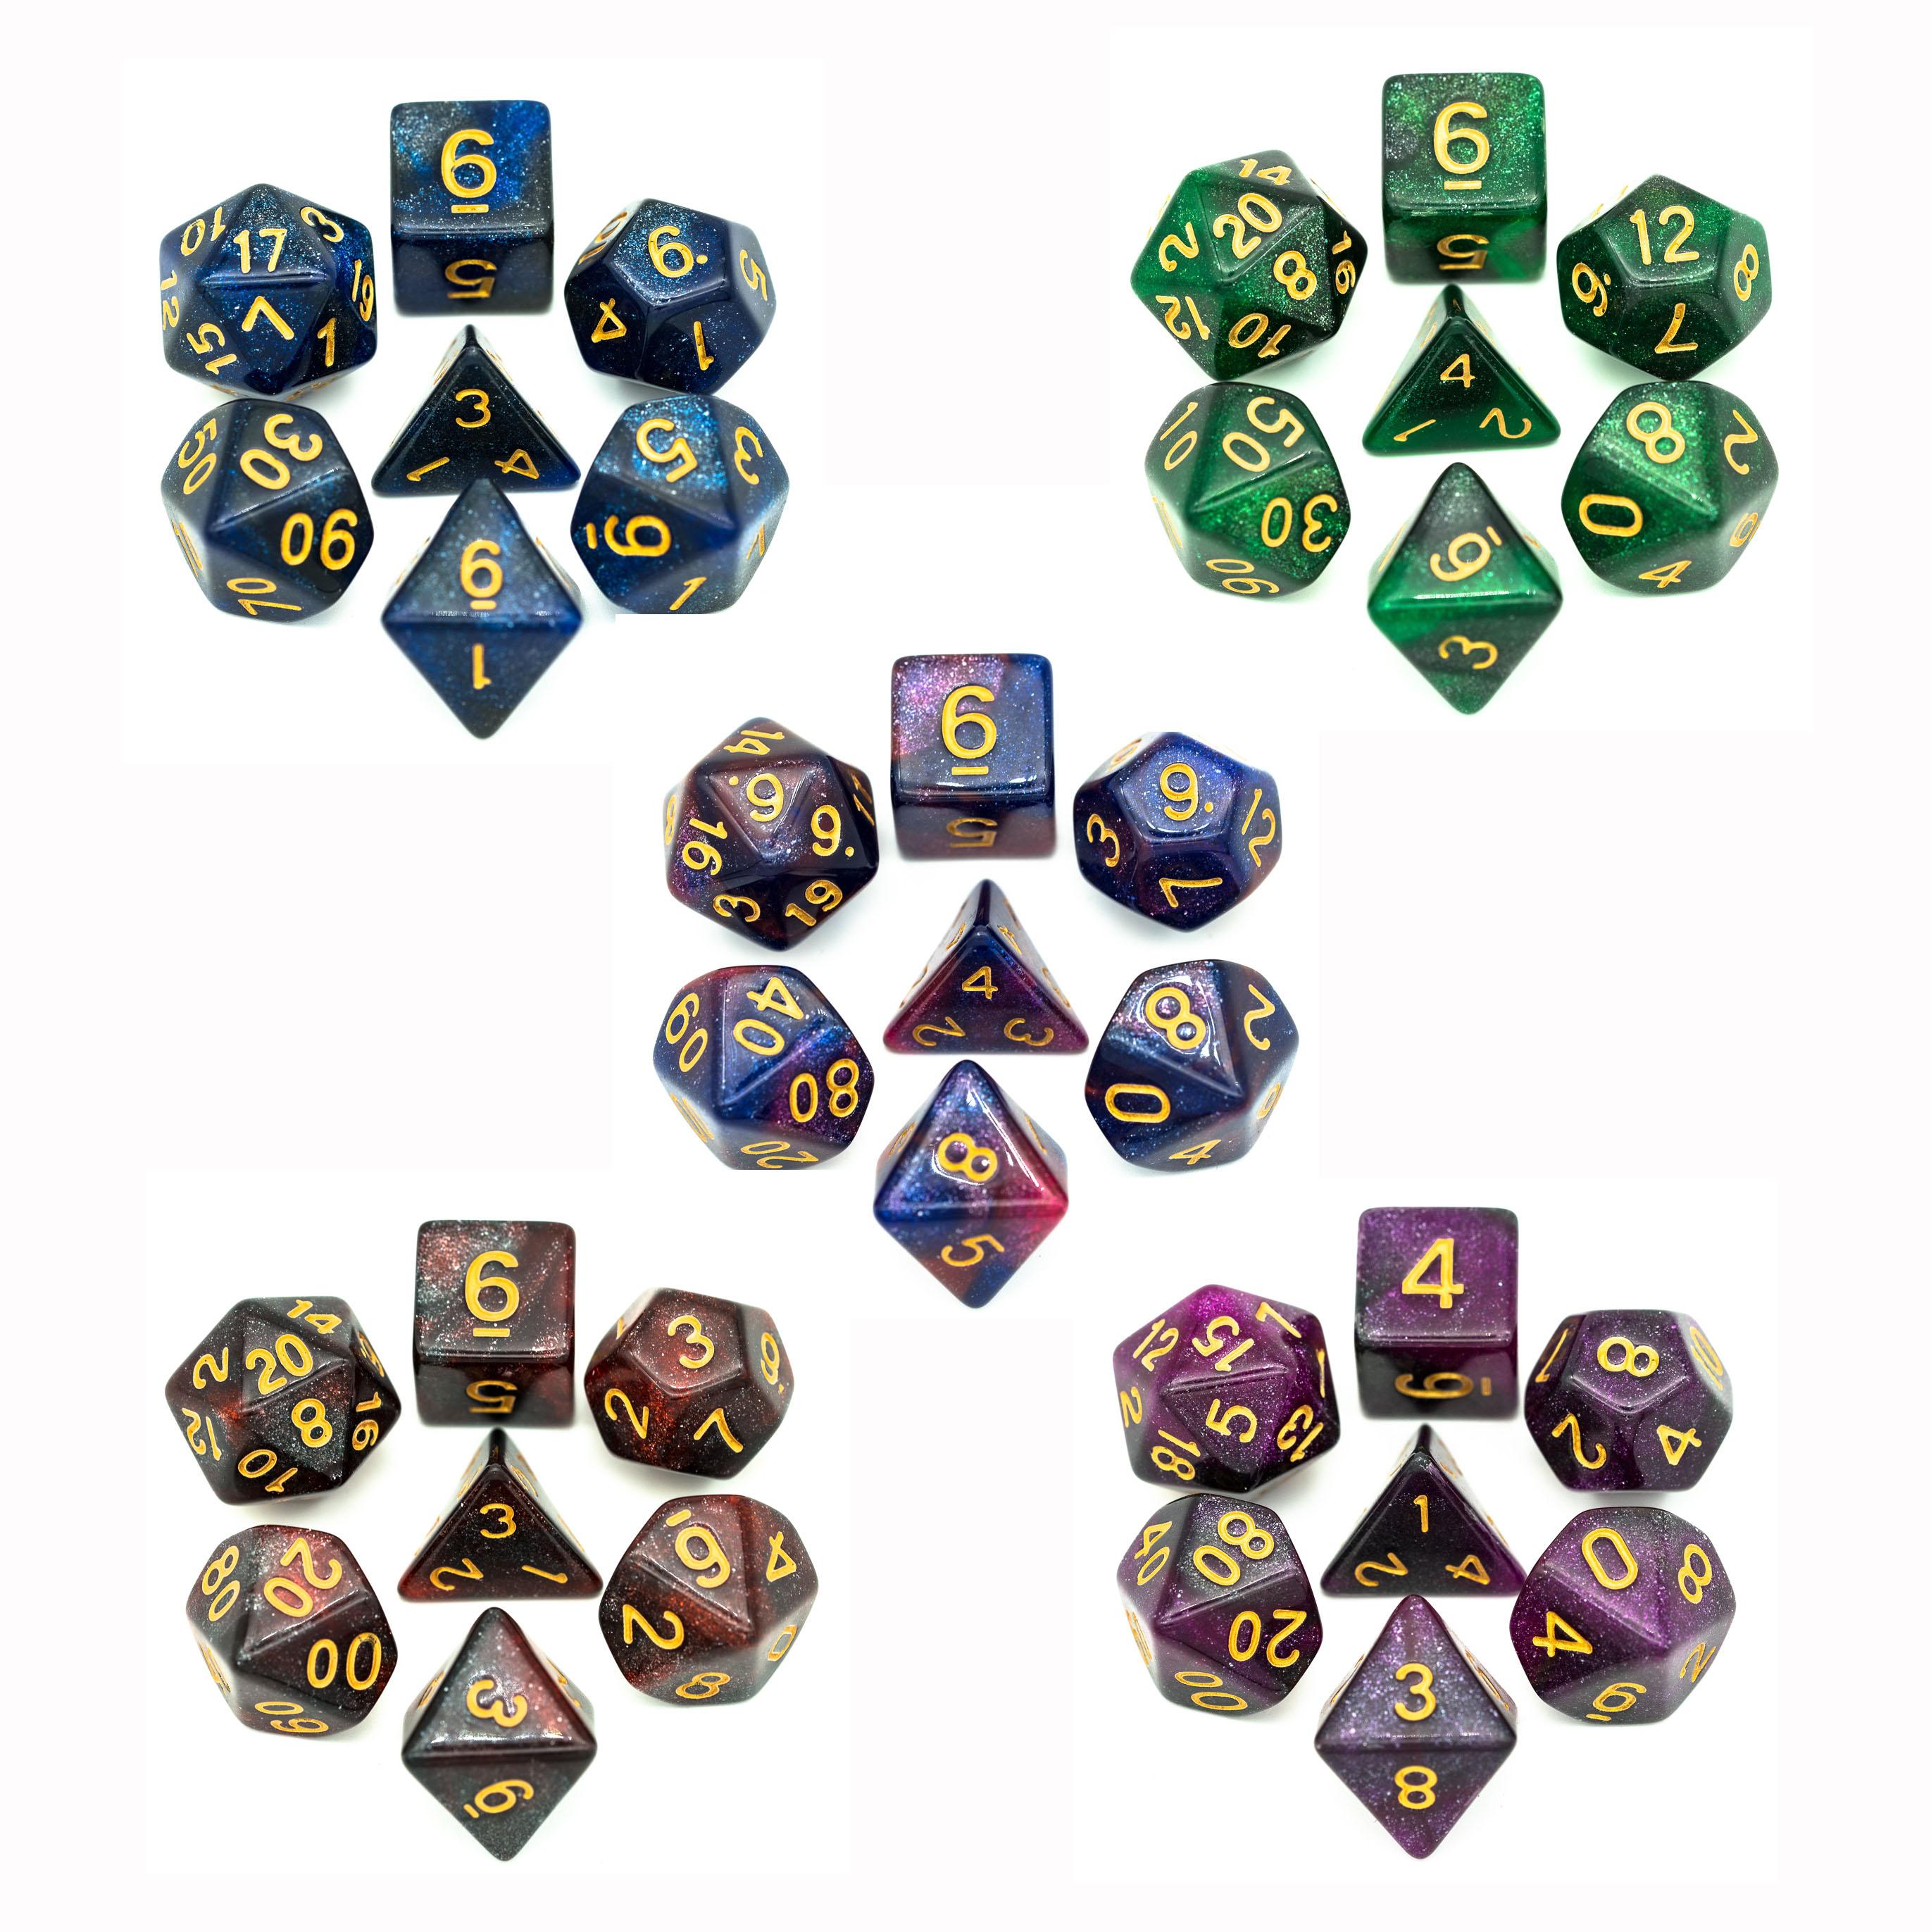 7 pz/set Galaxy DND Dadi D & D Dadi D4 D6 D8 D10 D % D12 D20 Poliedrici Giochi di Dadi set per MTG RPG